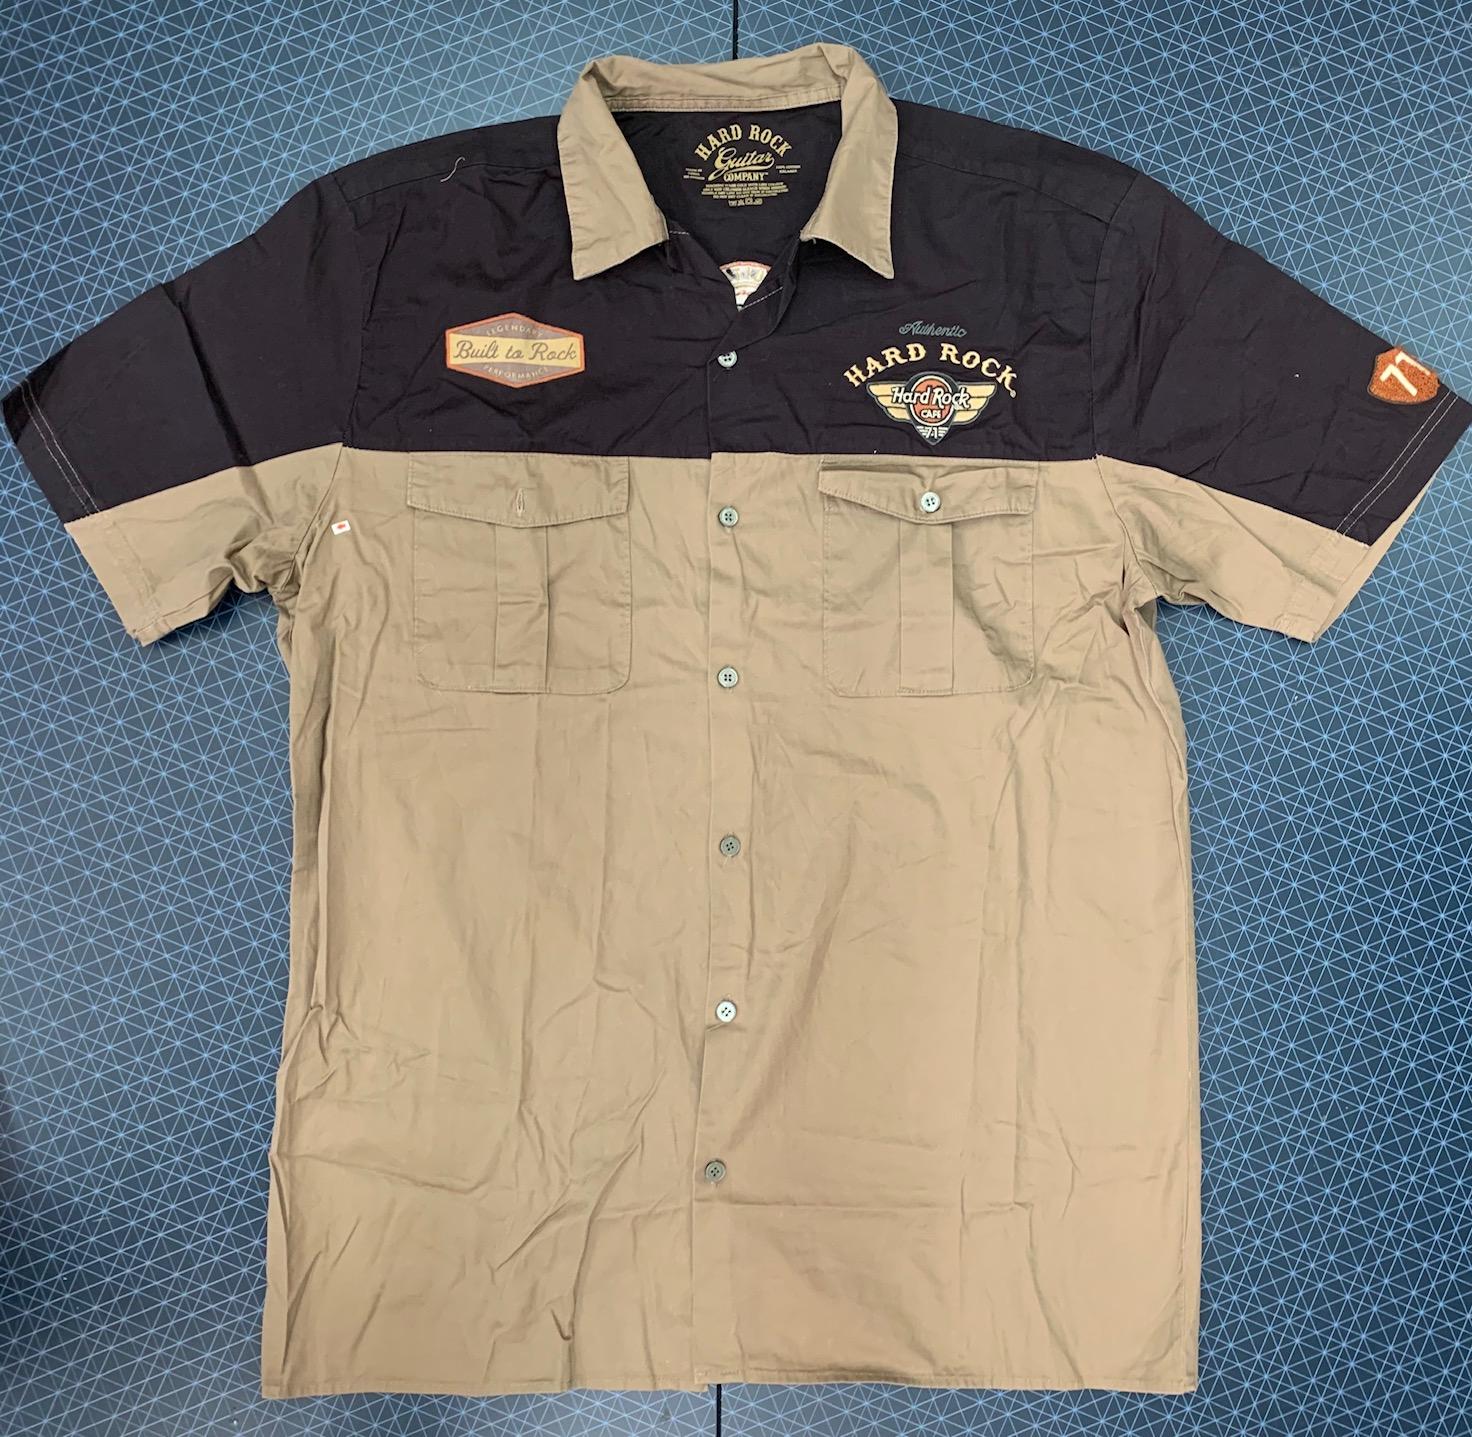 Рубашка двухцветная мужская НARD ROCK